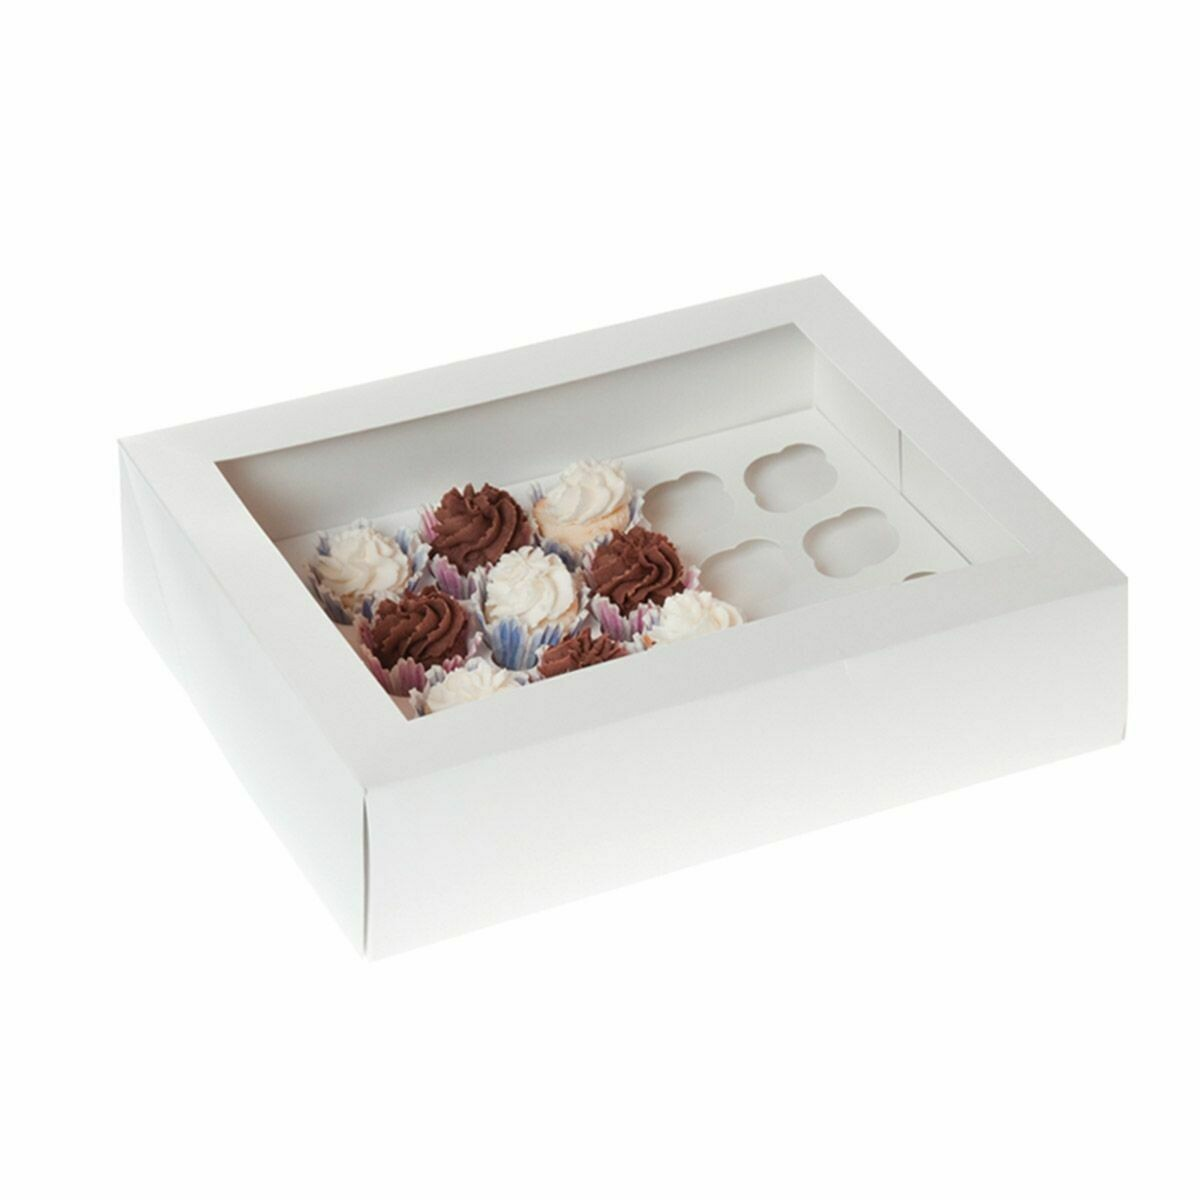 House of Marie -Box for 24 MINI CUPCAKES - Κουτί για 24 Μίνι Καπκέϊκς/Μάφινς -2τμχ